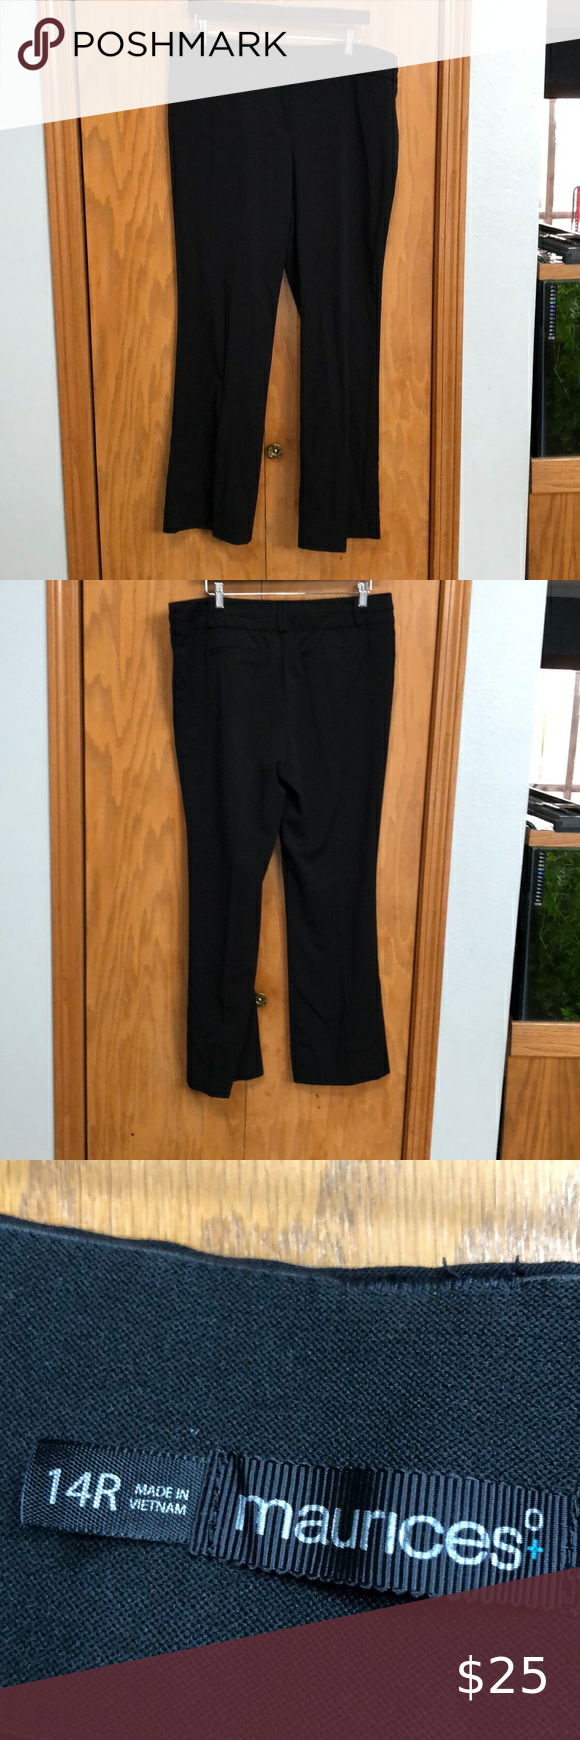 Women S Black Dress Pants From Maurices Women S Black Dress Pants 14 Regular But I Usually Get Tall A Black Dress Pants Womens Black Dress Pants Dress Pants [ 1740 x 580 Pixel ]